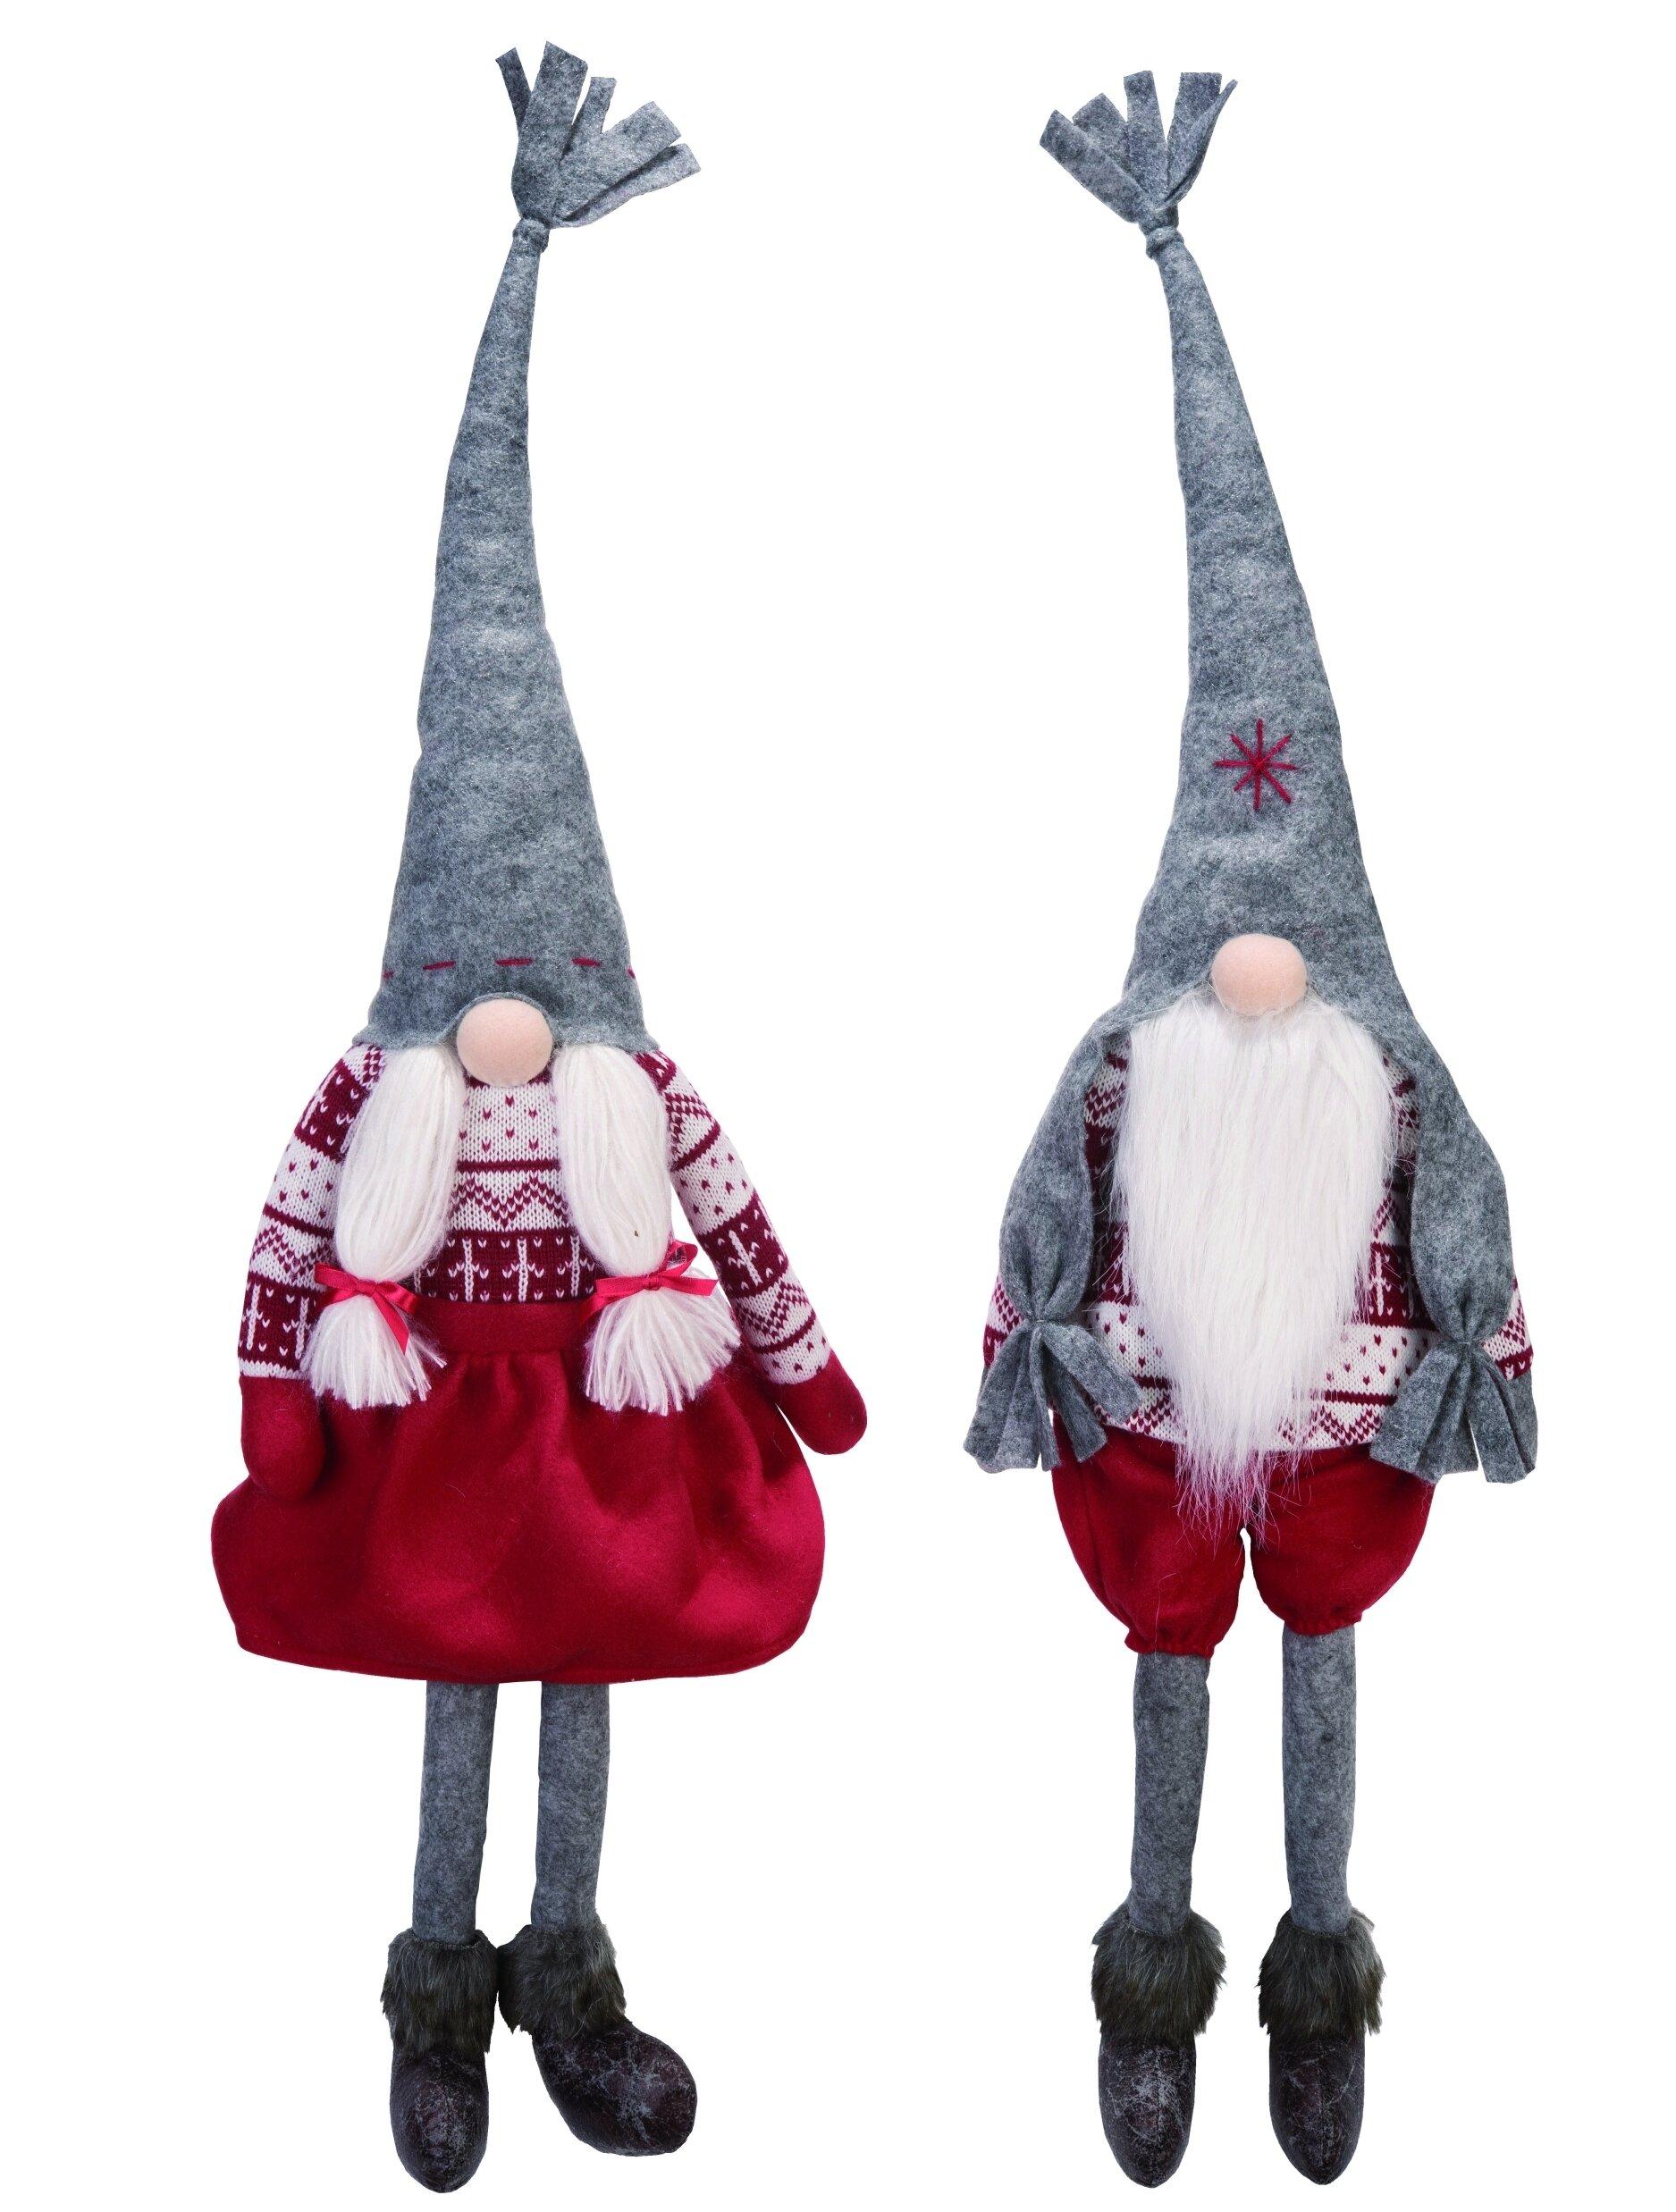 The Holiday Aisle 2 Piece Fabric Christmas Plush Gnome Shelf Sitter Set Wayfair